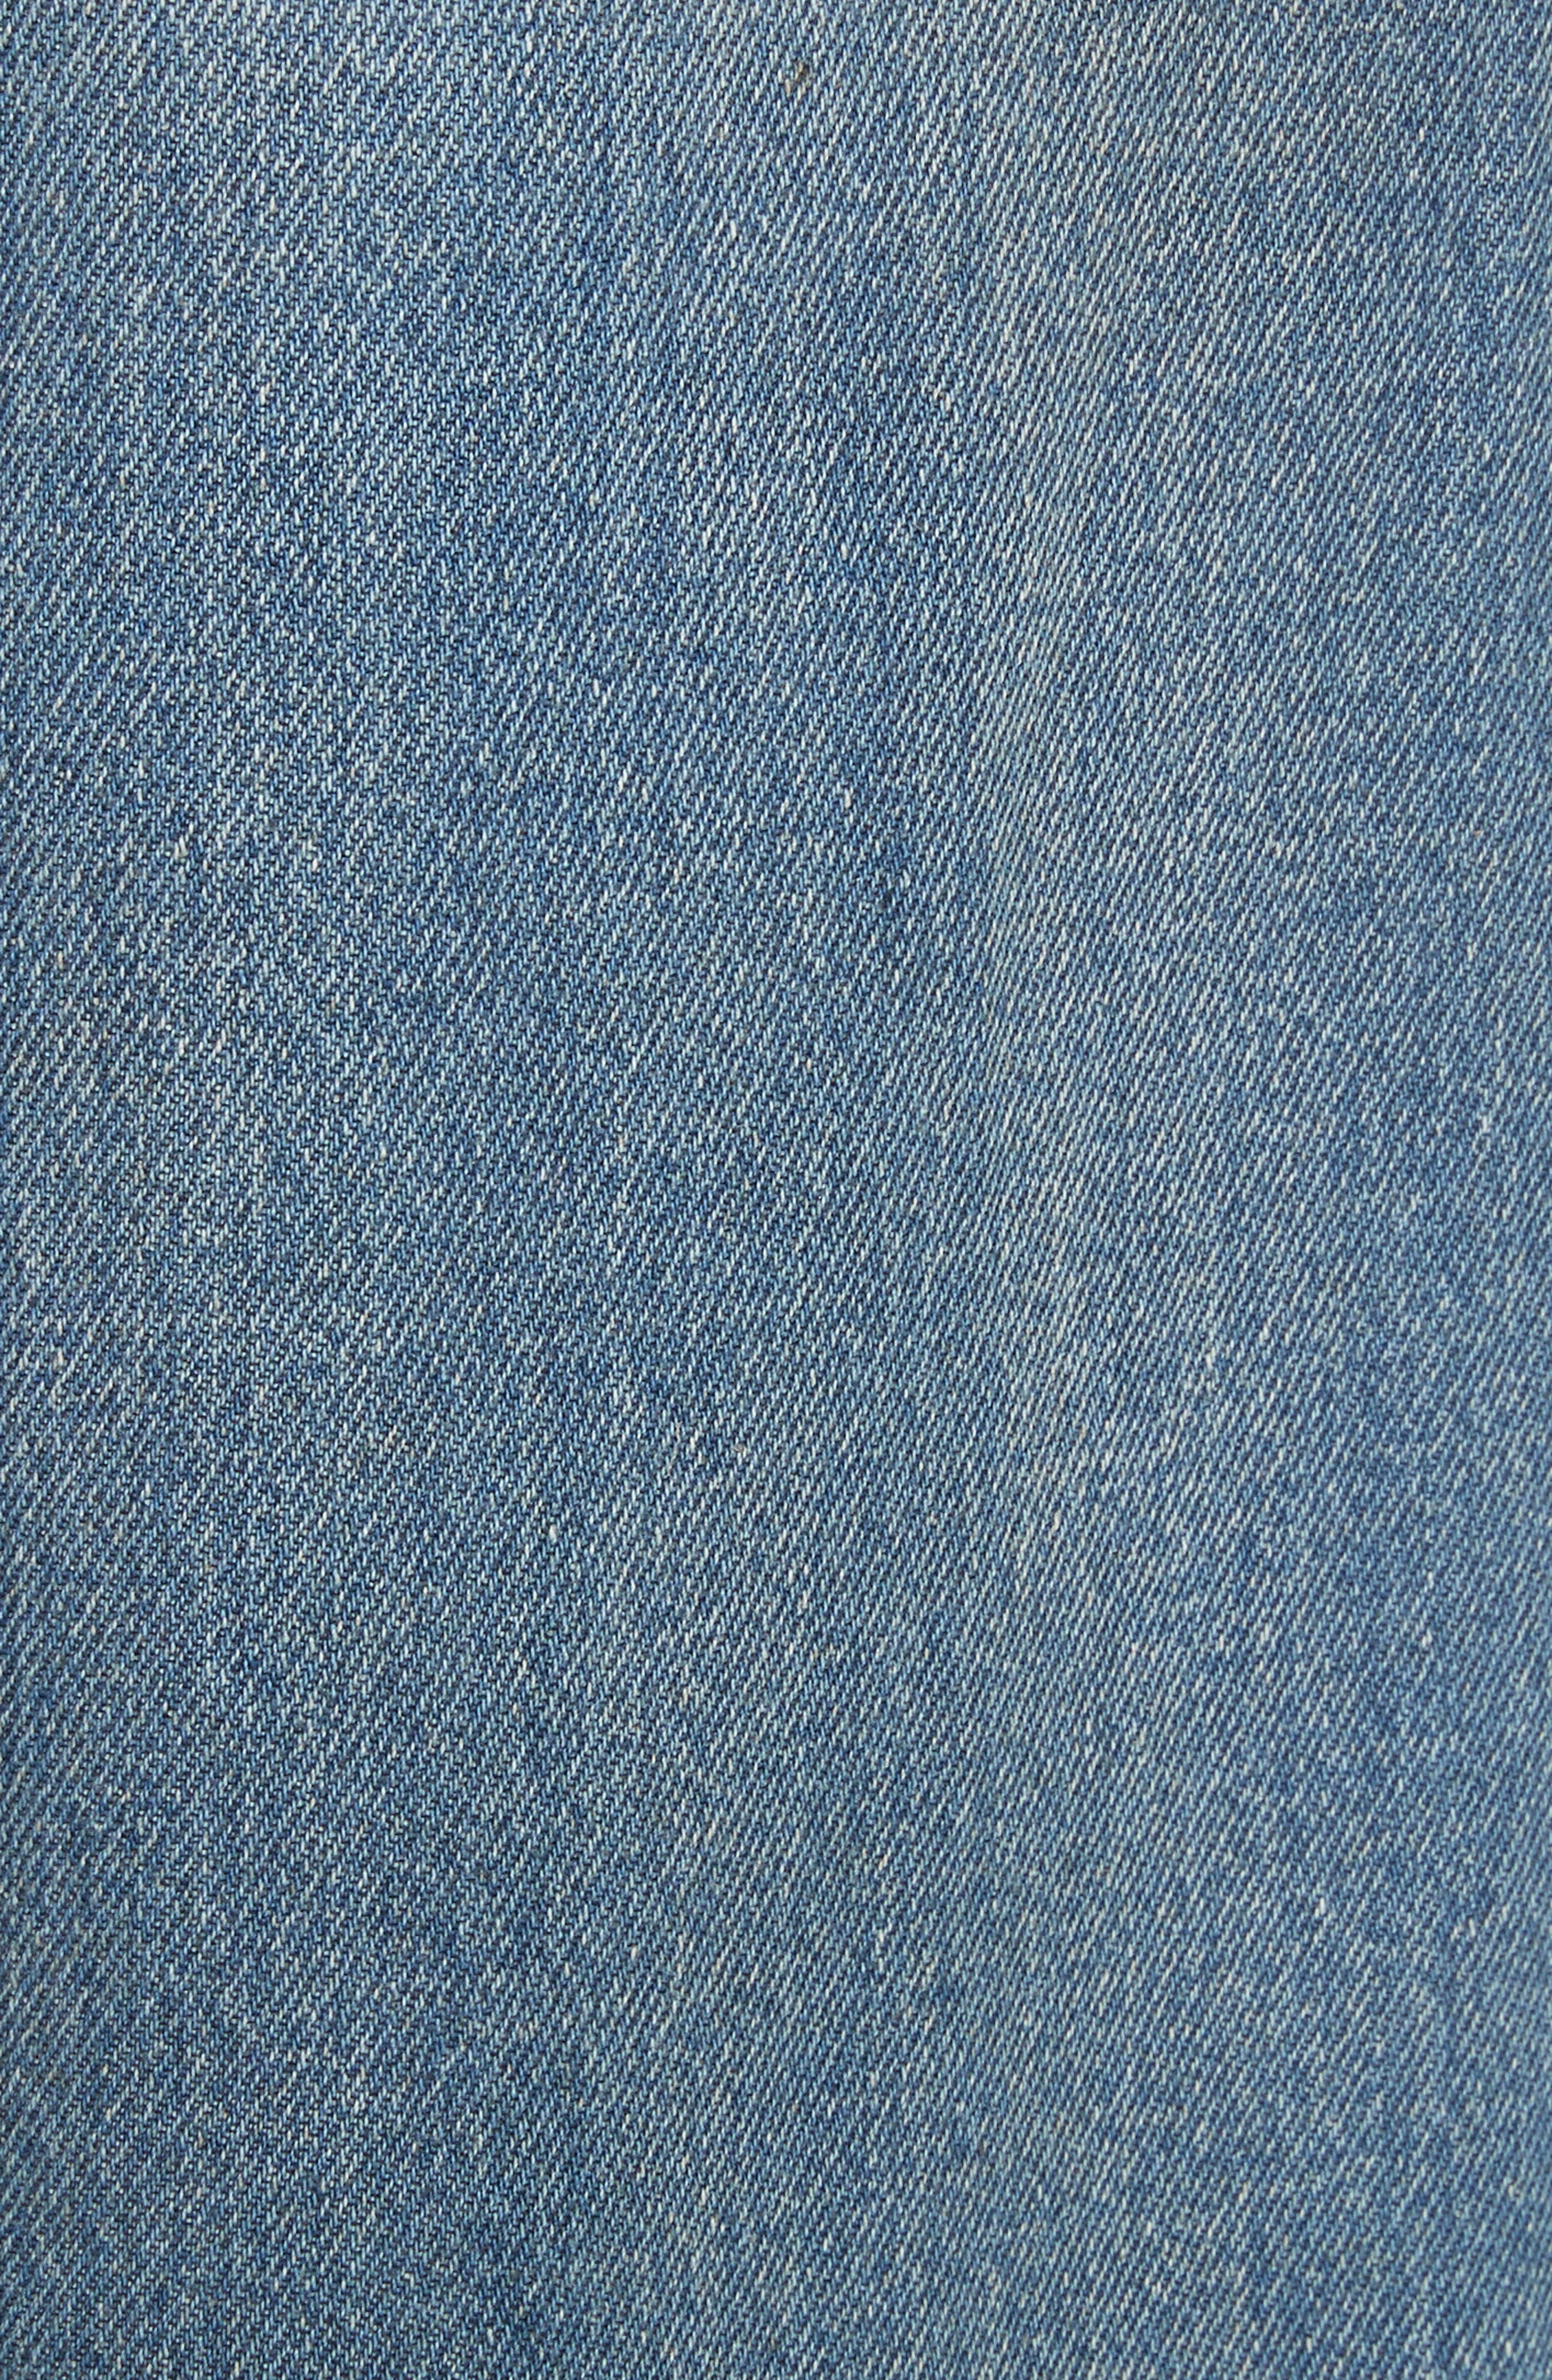 Drawstring Wide Leg Jeans,                             Alternate thumbnail 5, color,                             Indigo Stone Wash